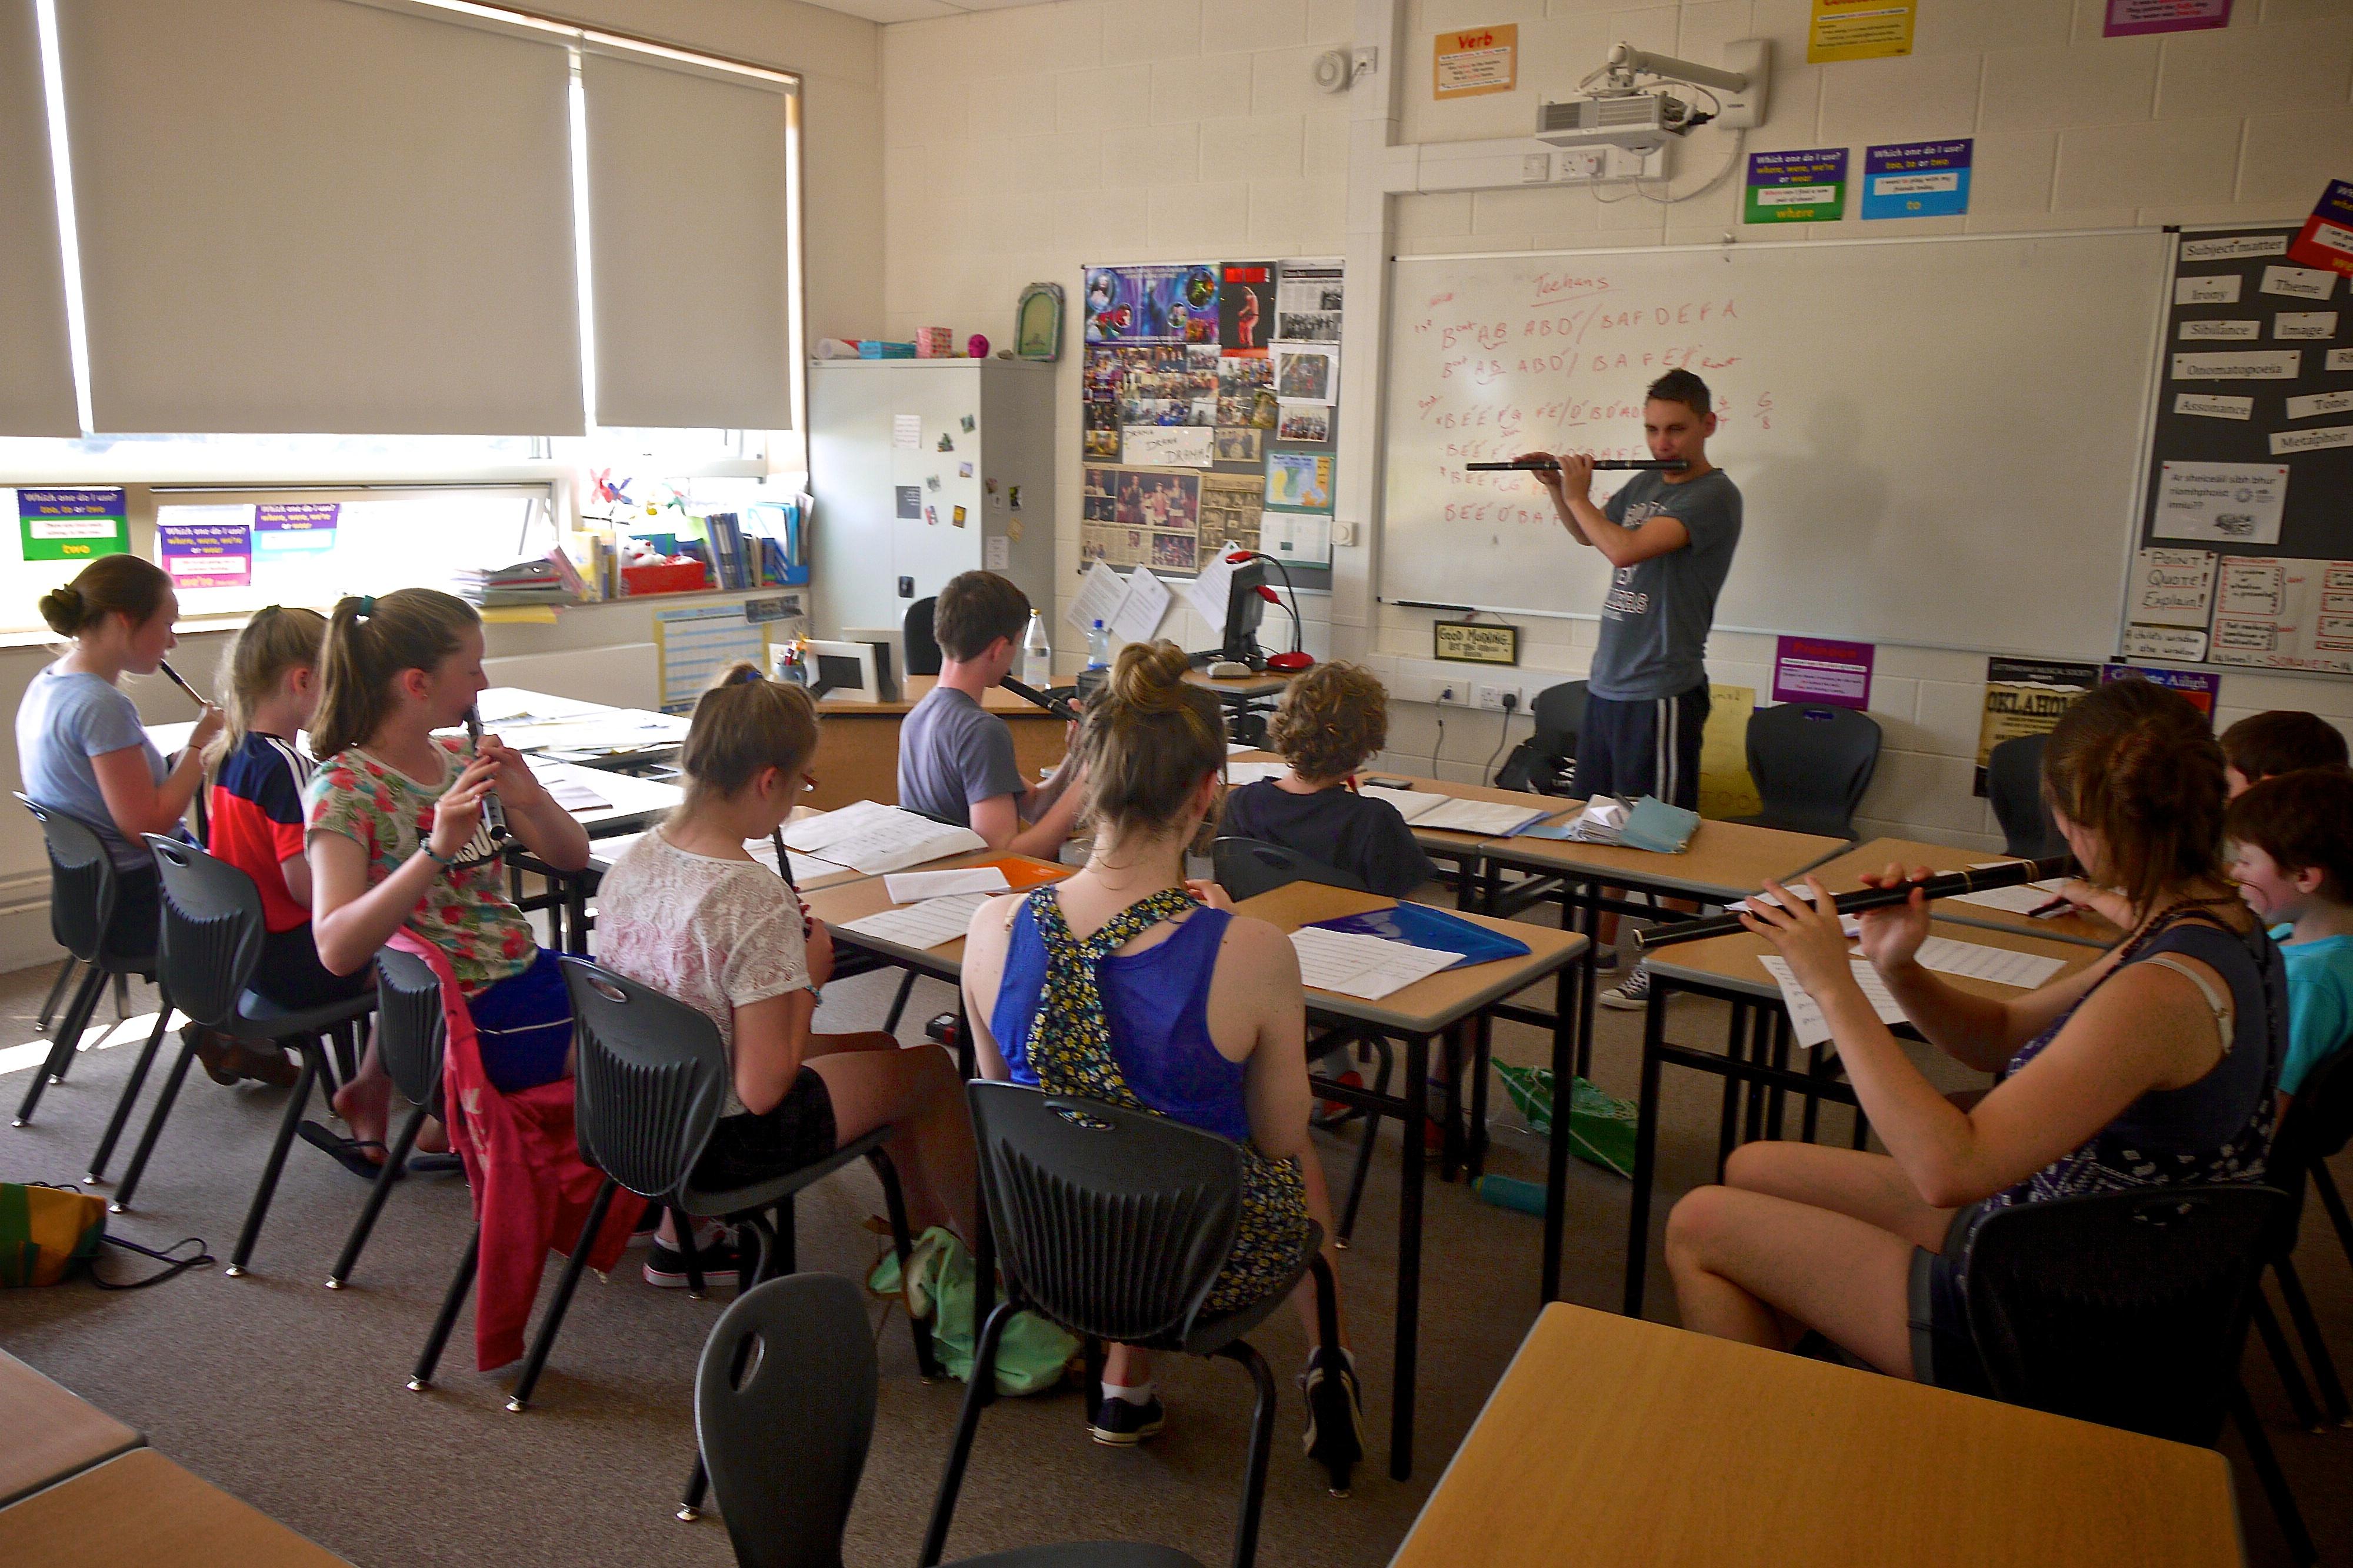 Ciaran Carlin Flute Class Ceol na Coille Summer School 2014